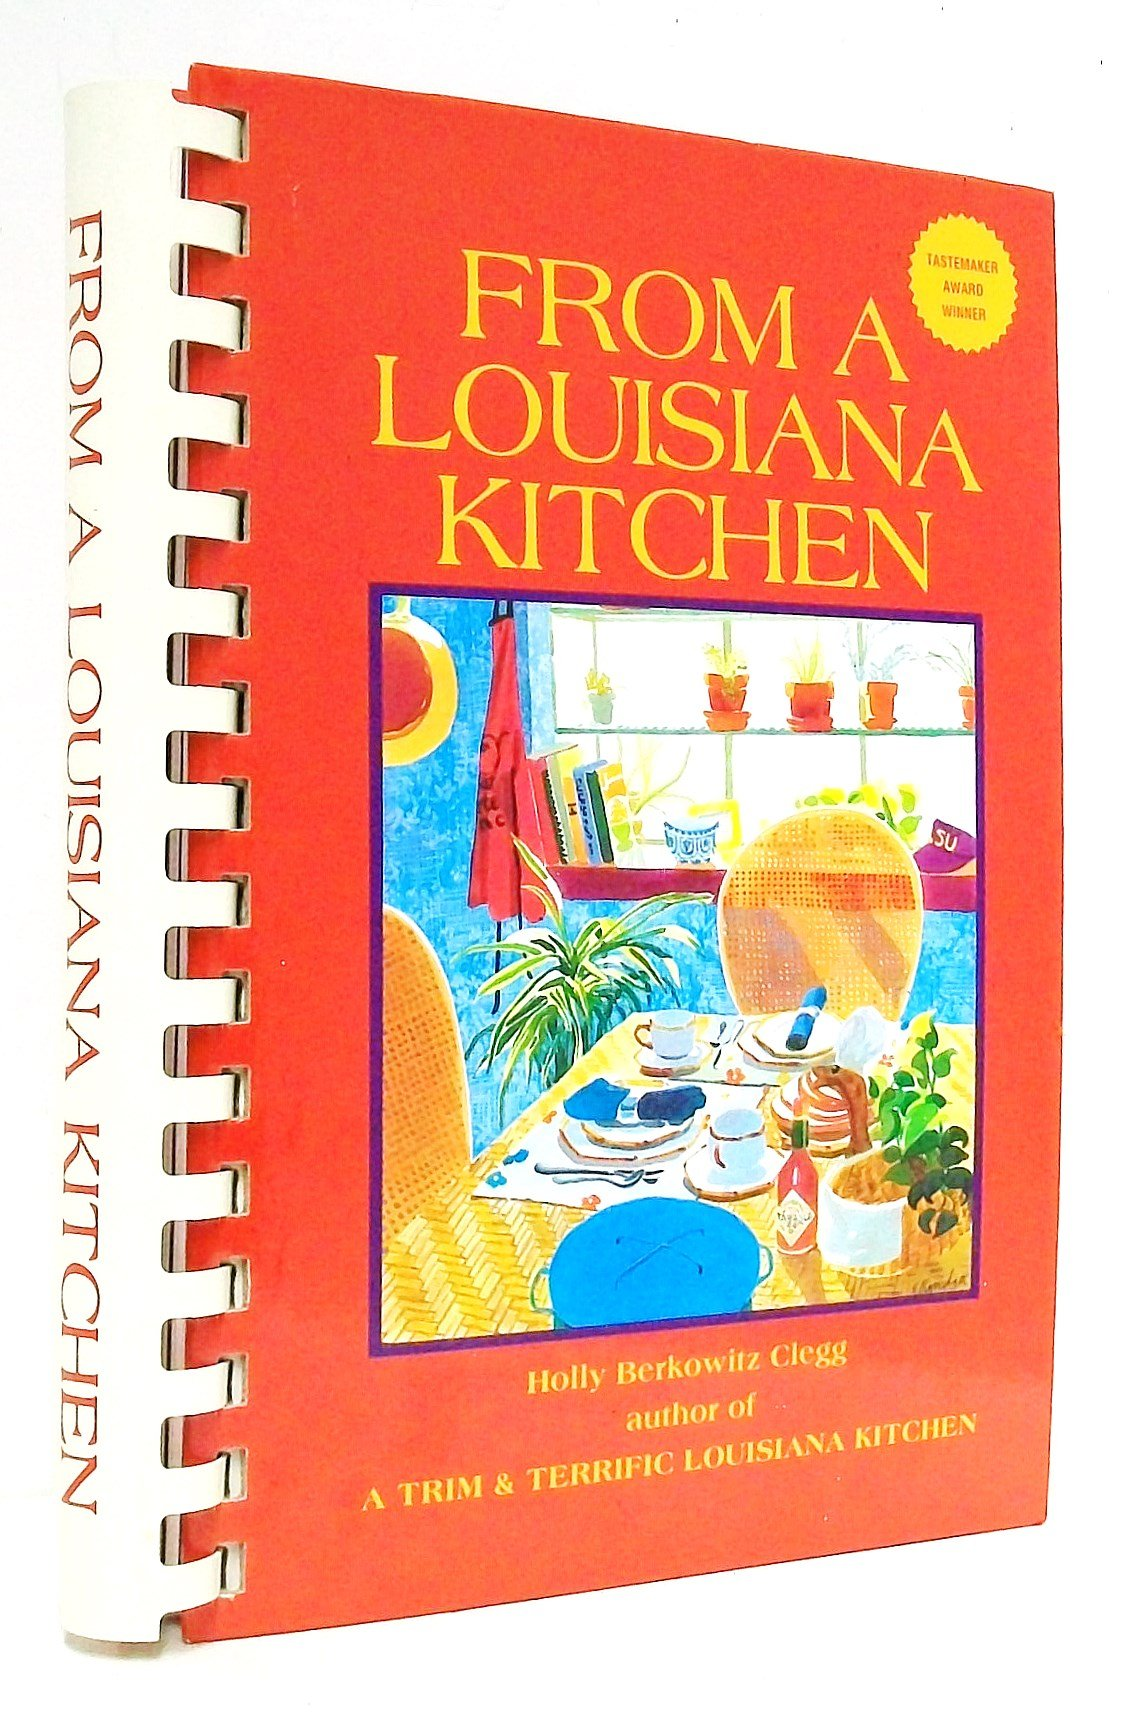 From a Louisiana Kitchen Holly Berkowitz Clegg 9780961088842